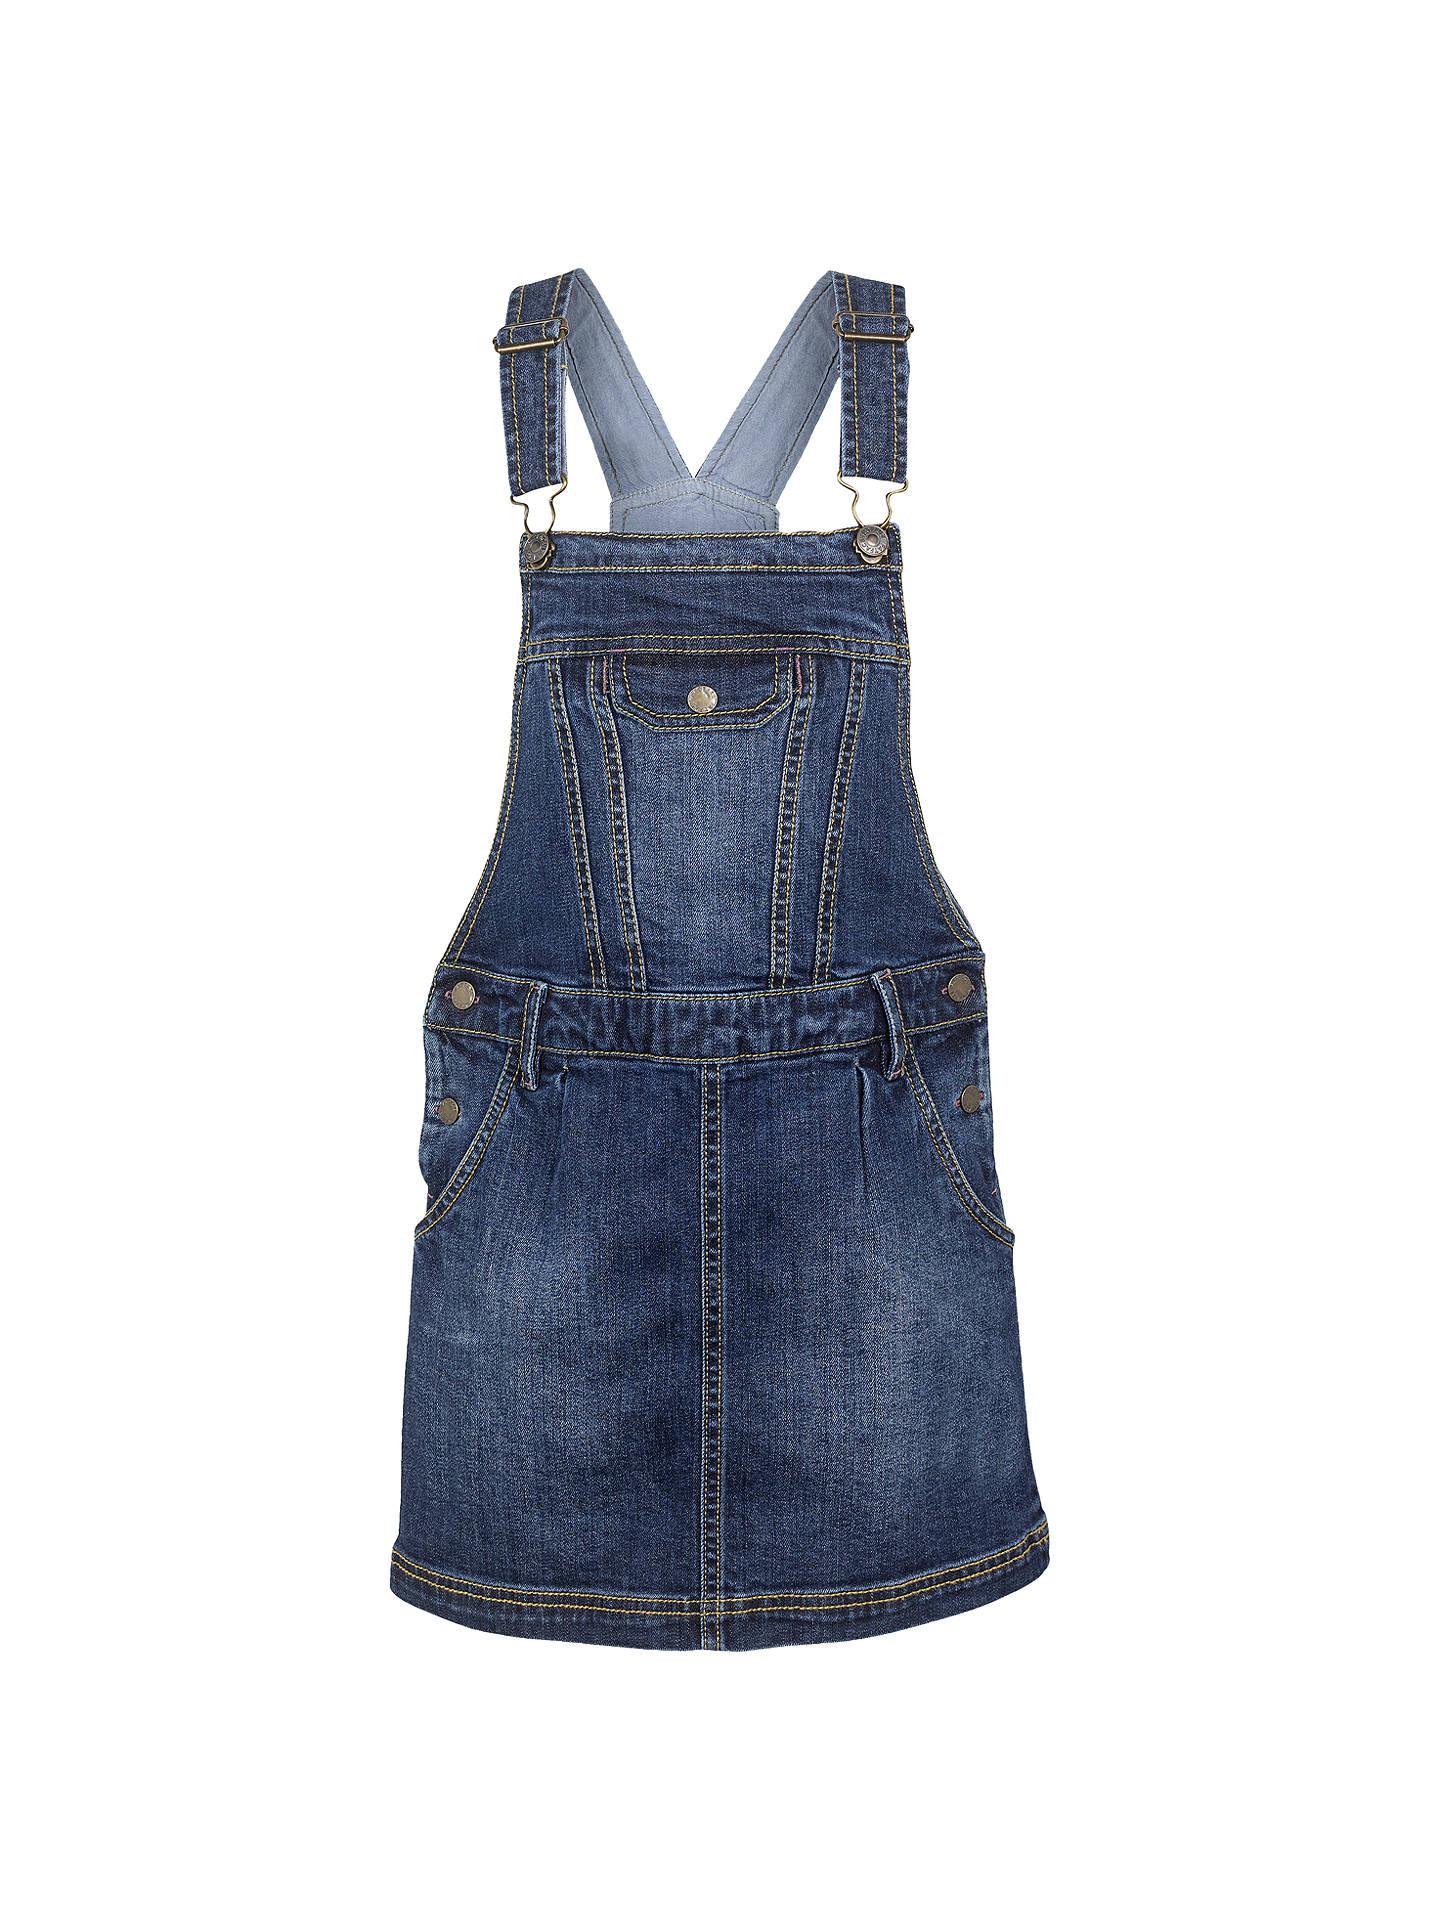 86806c8c1e1c Buy Fat Face Girls' Denim Pinafore Dress, Denim, 2-3 years Online ...